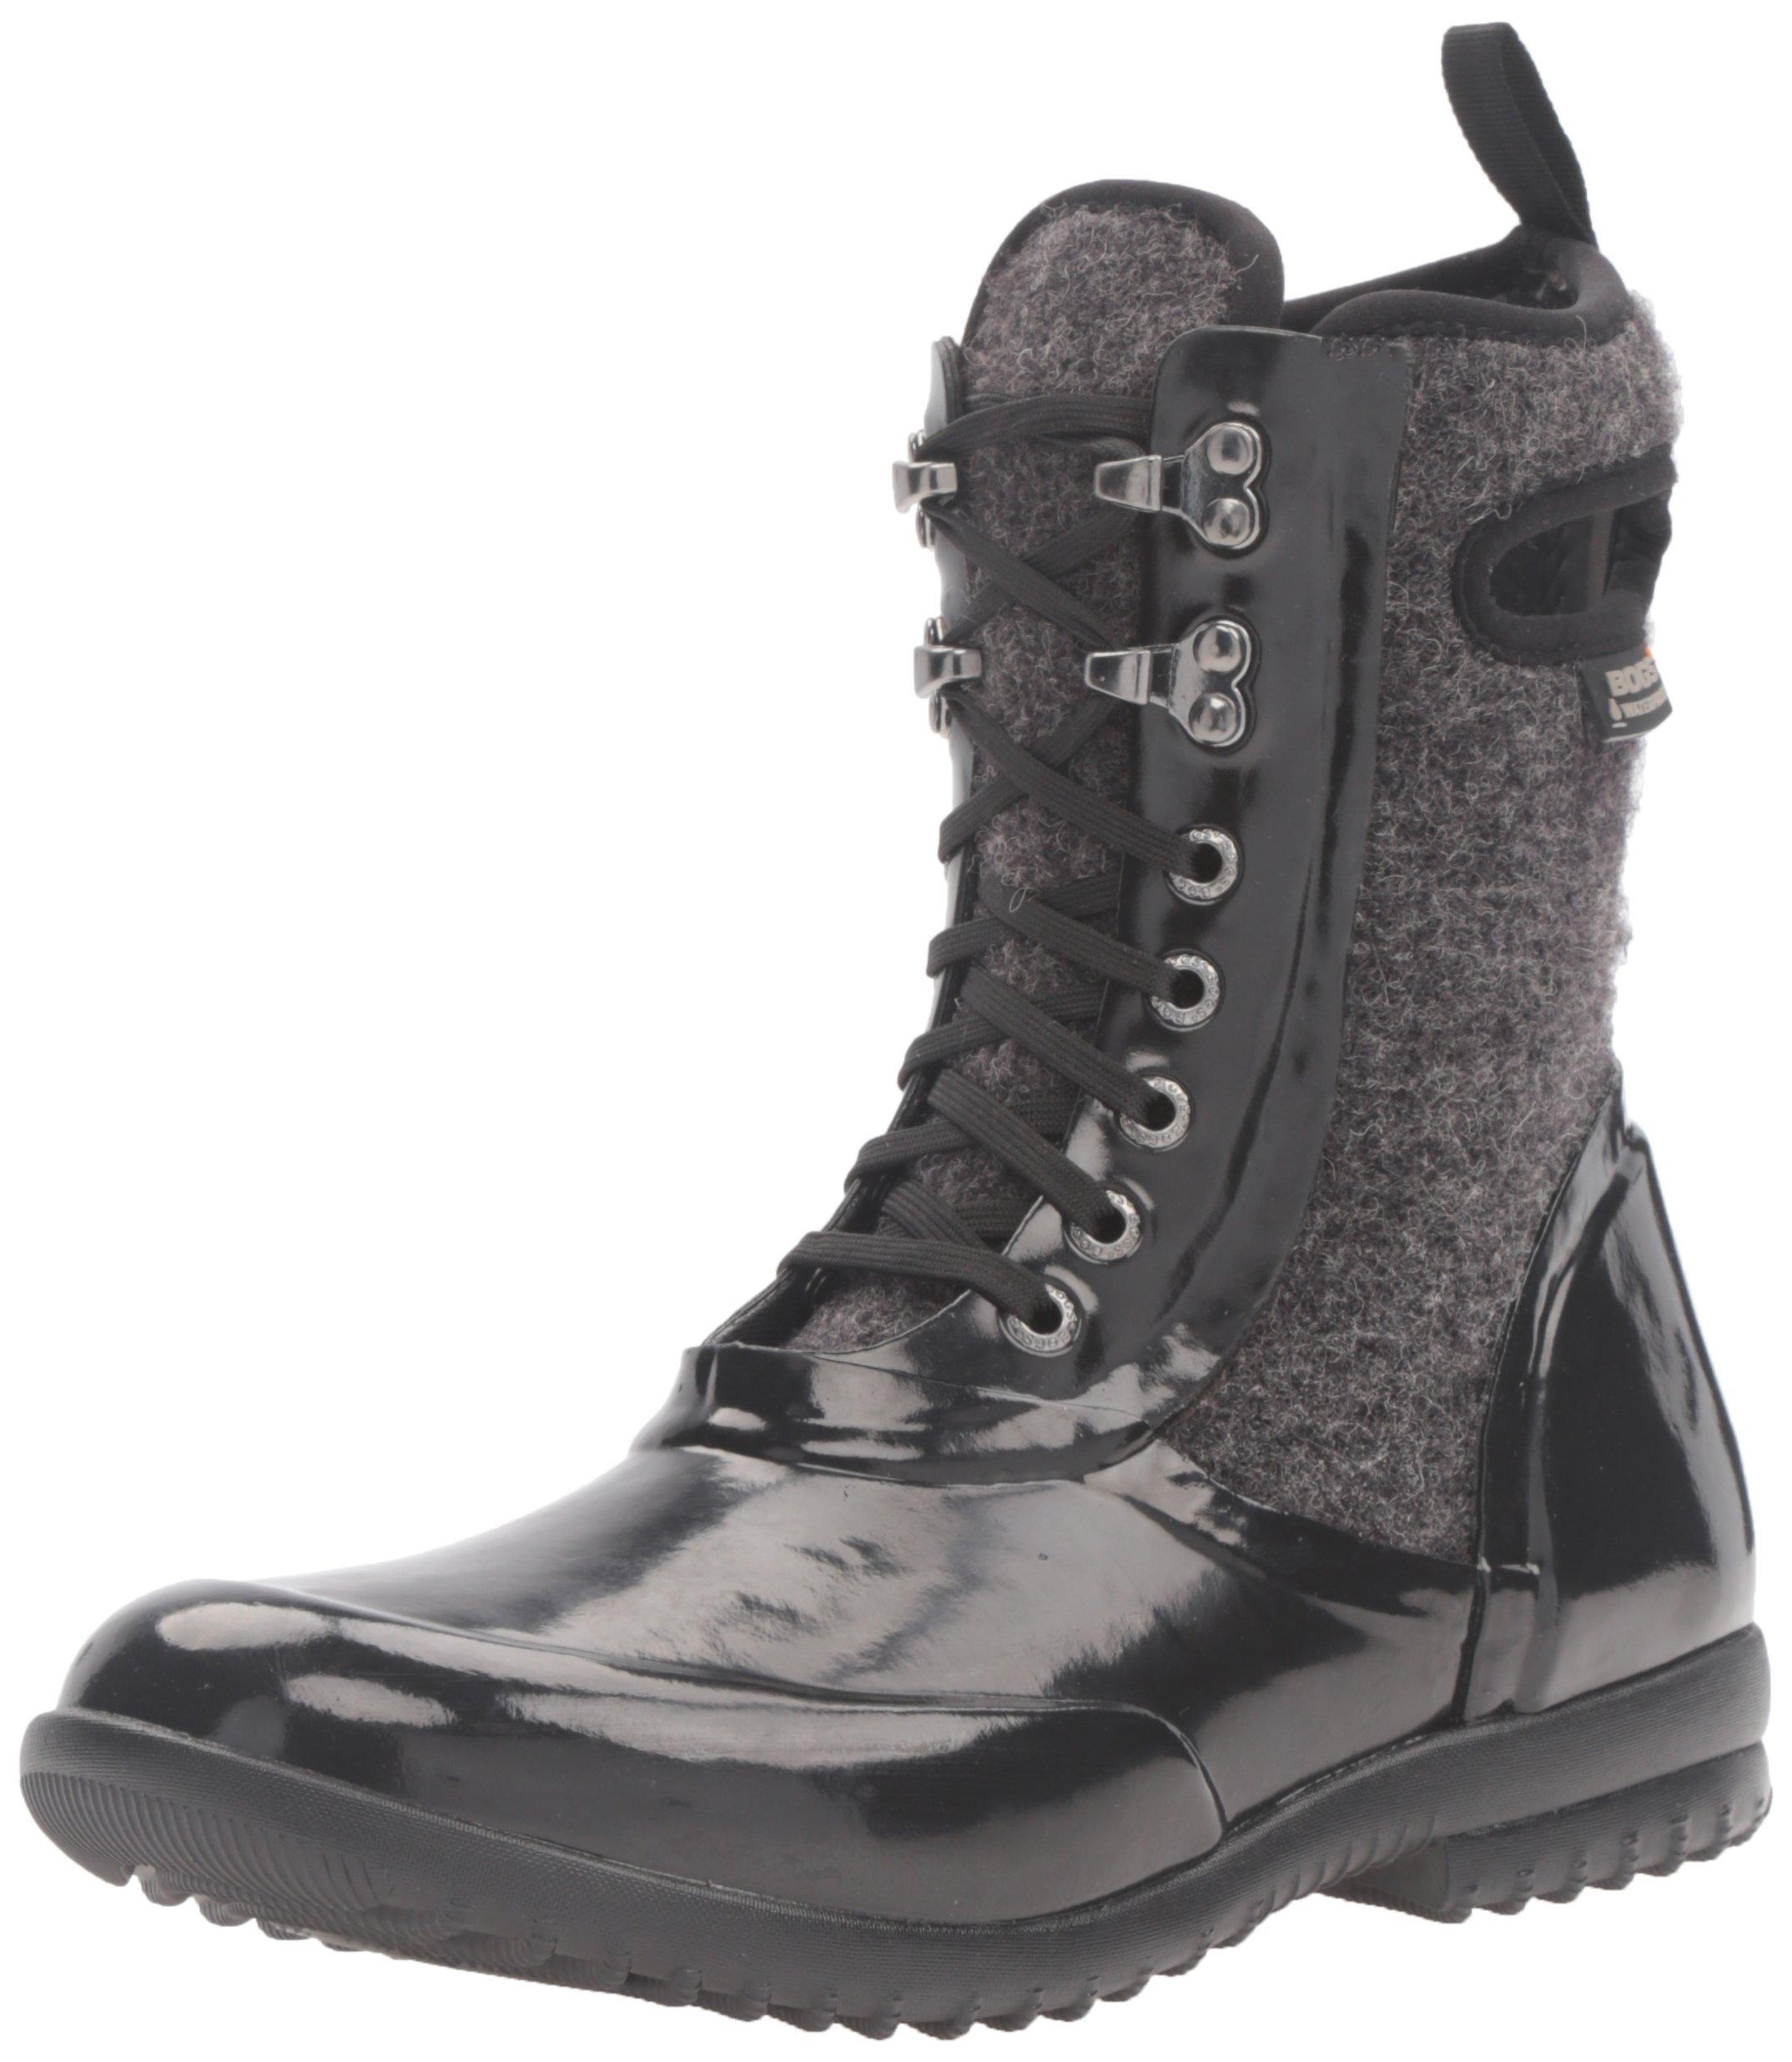 Bogs Women's Sidney Lace up Waterproof Insulated Rain Boot, Wool/Black, 7 B(M) US